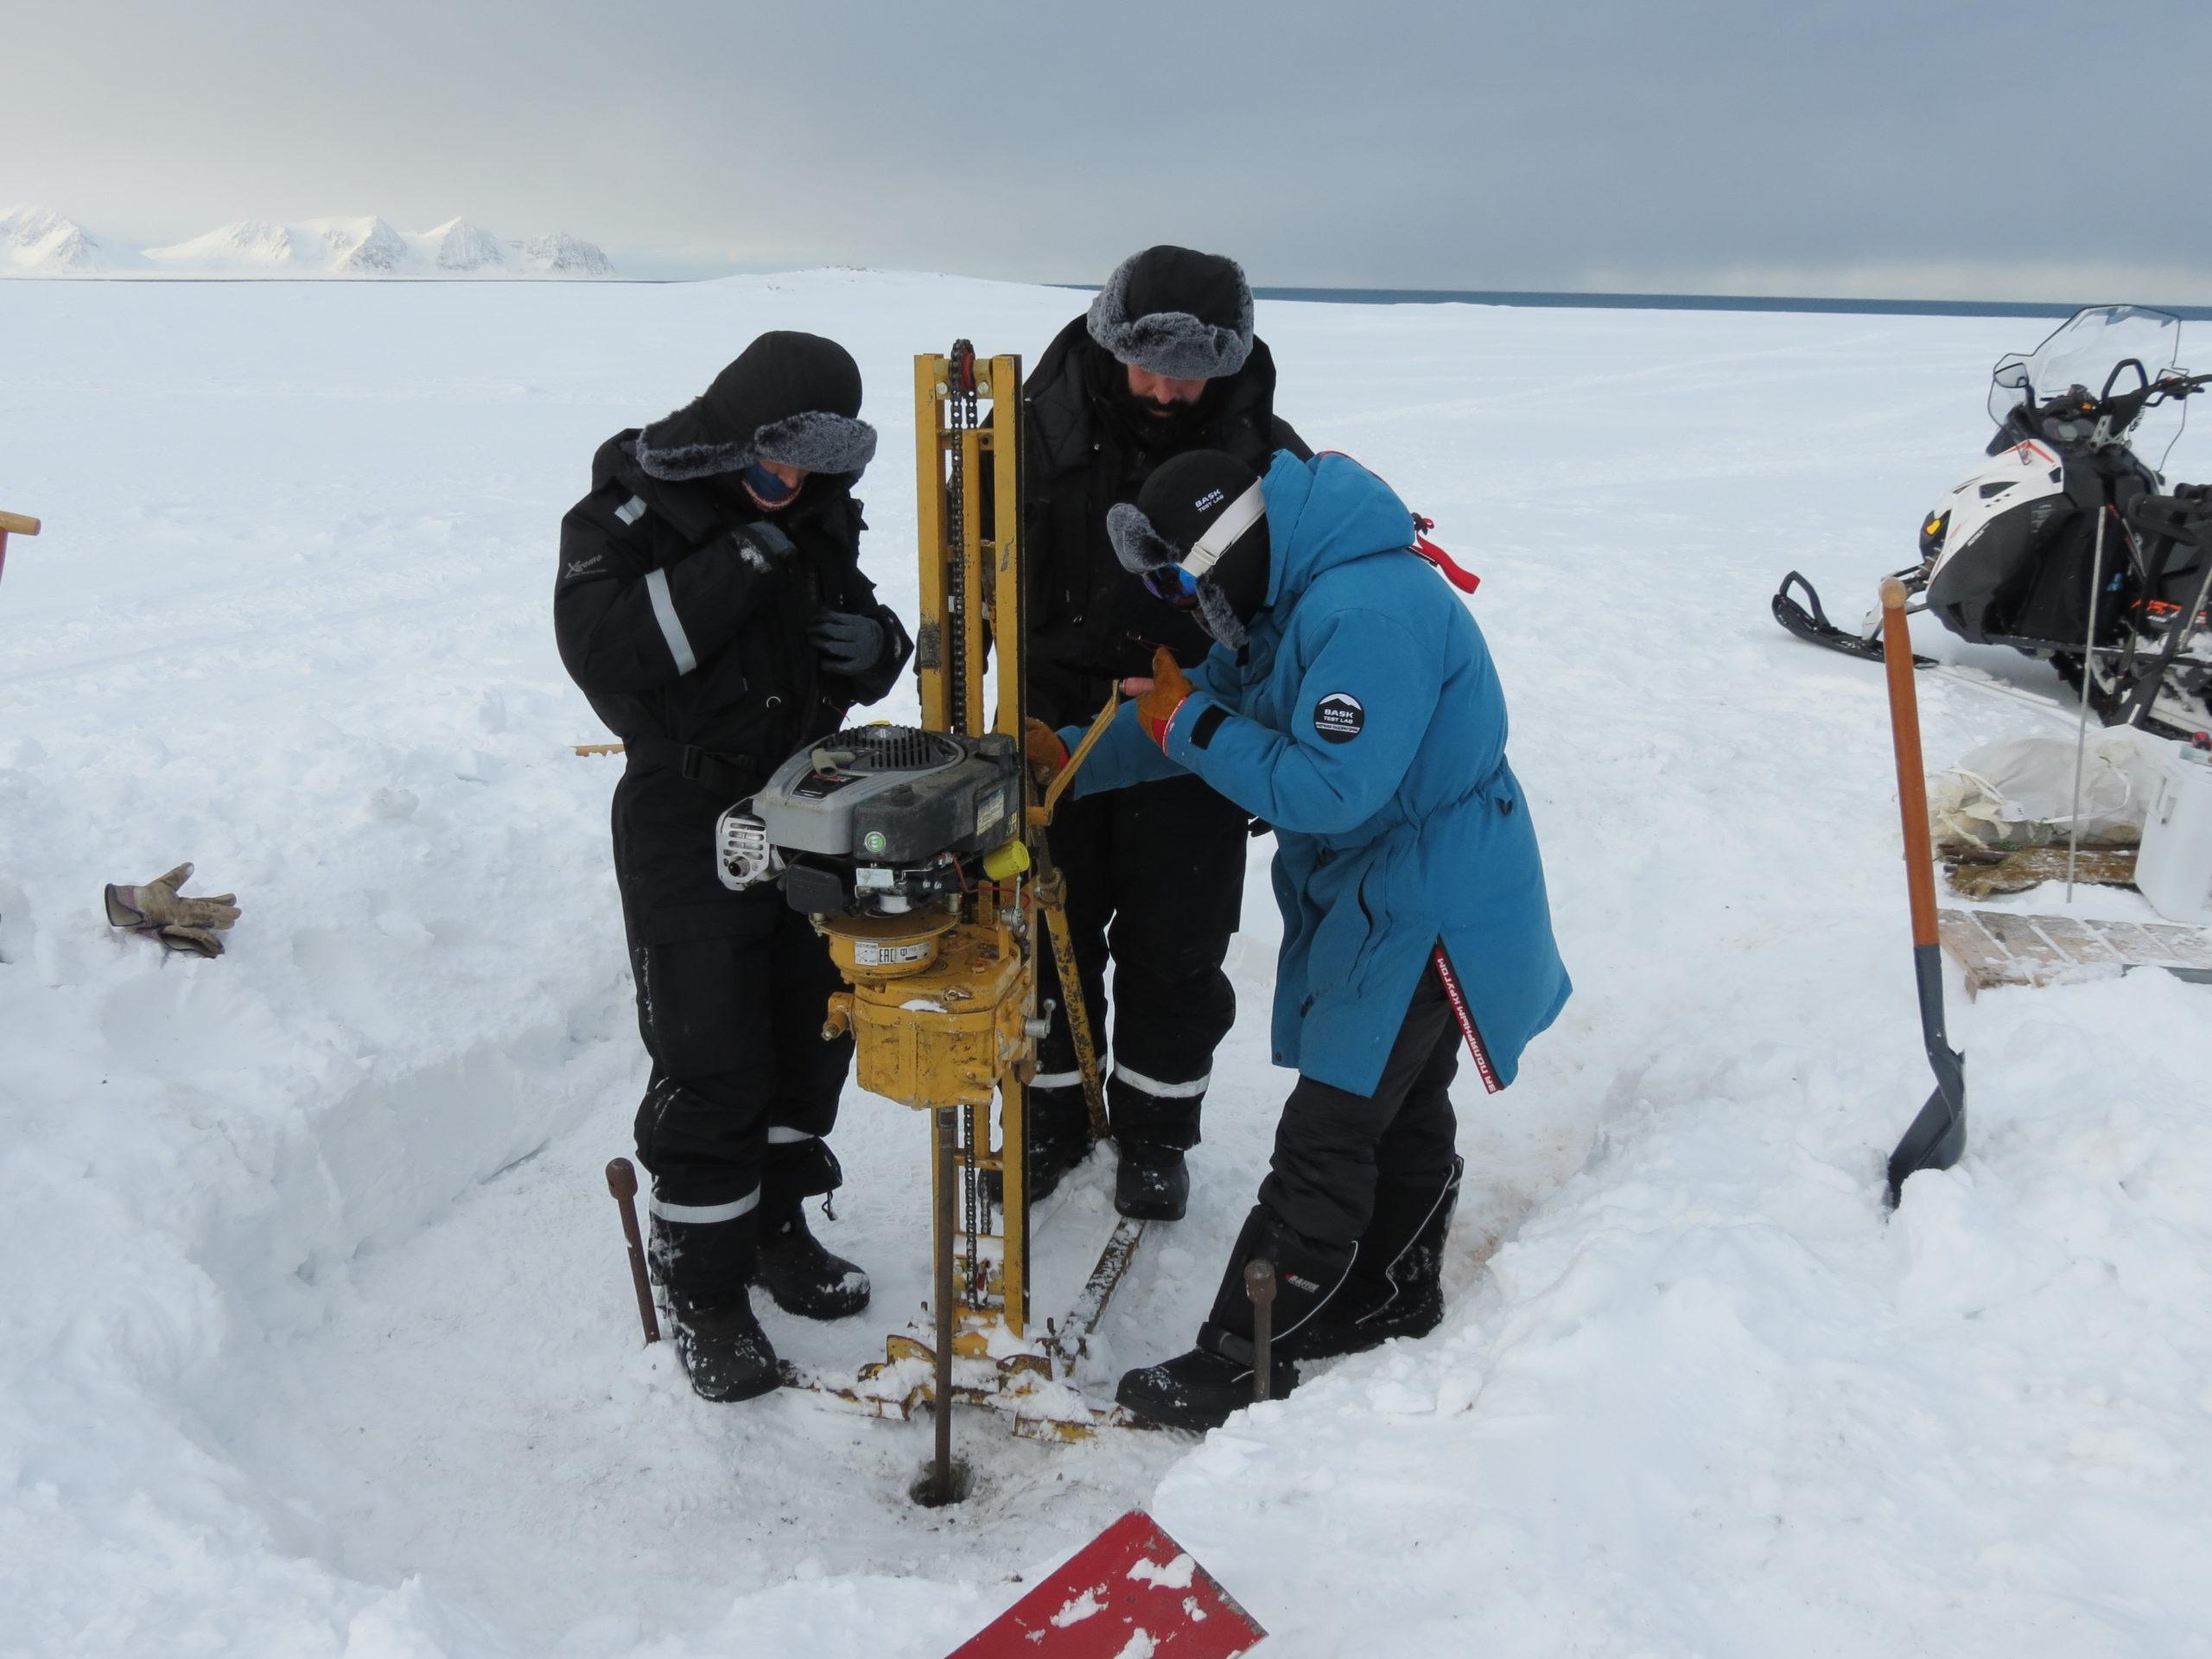 Karen Lloyd, Donato Giovannelli, and Andrey Abramov drilling permafrost